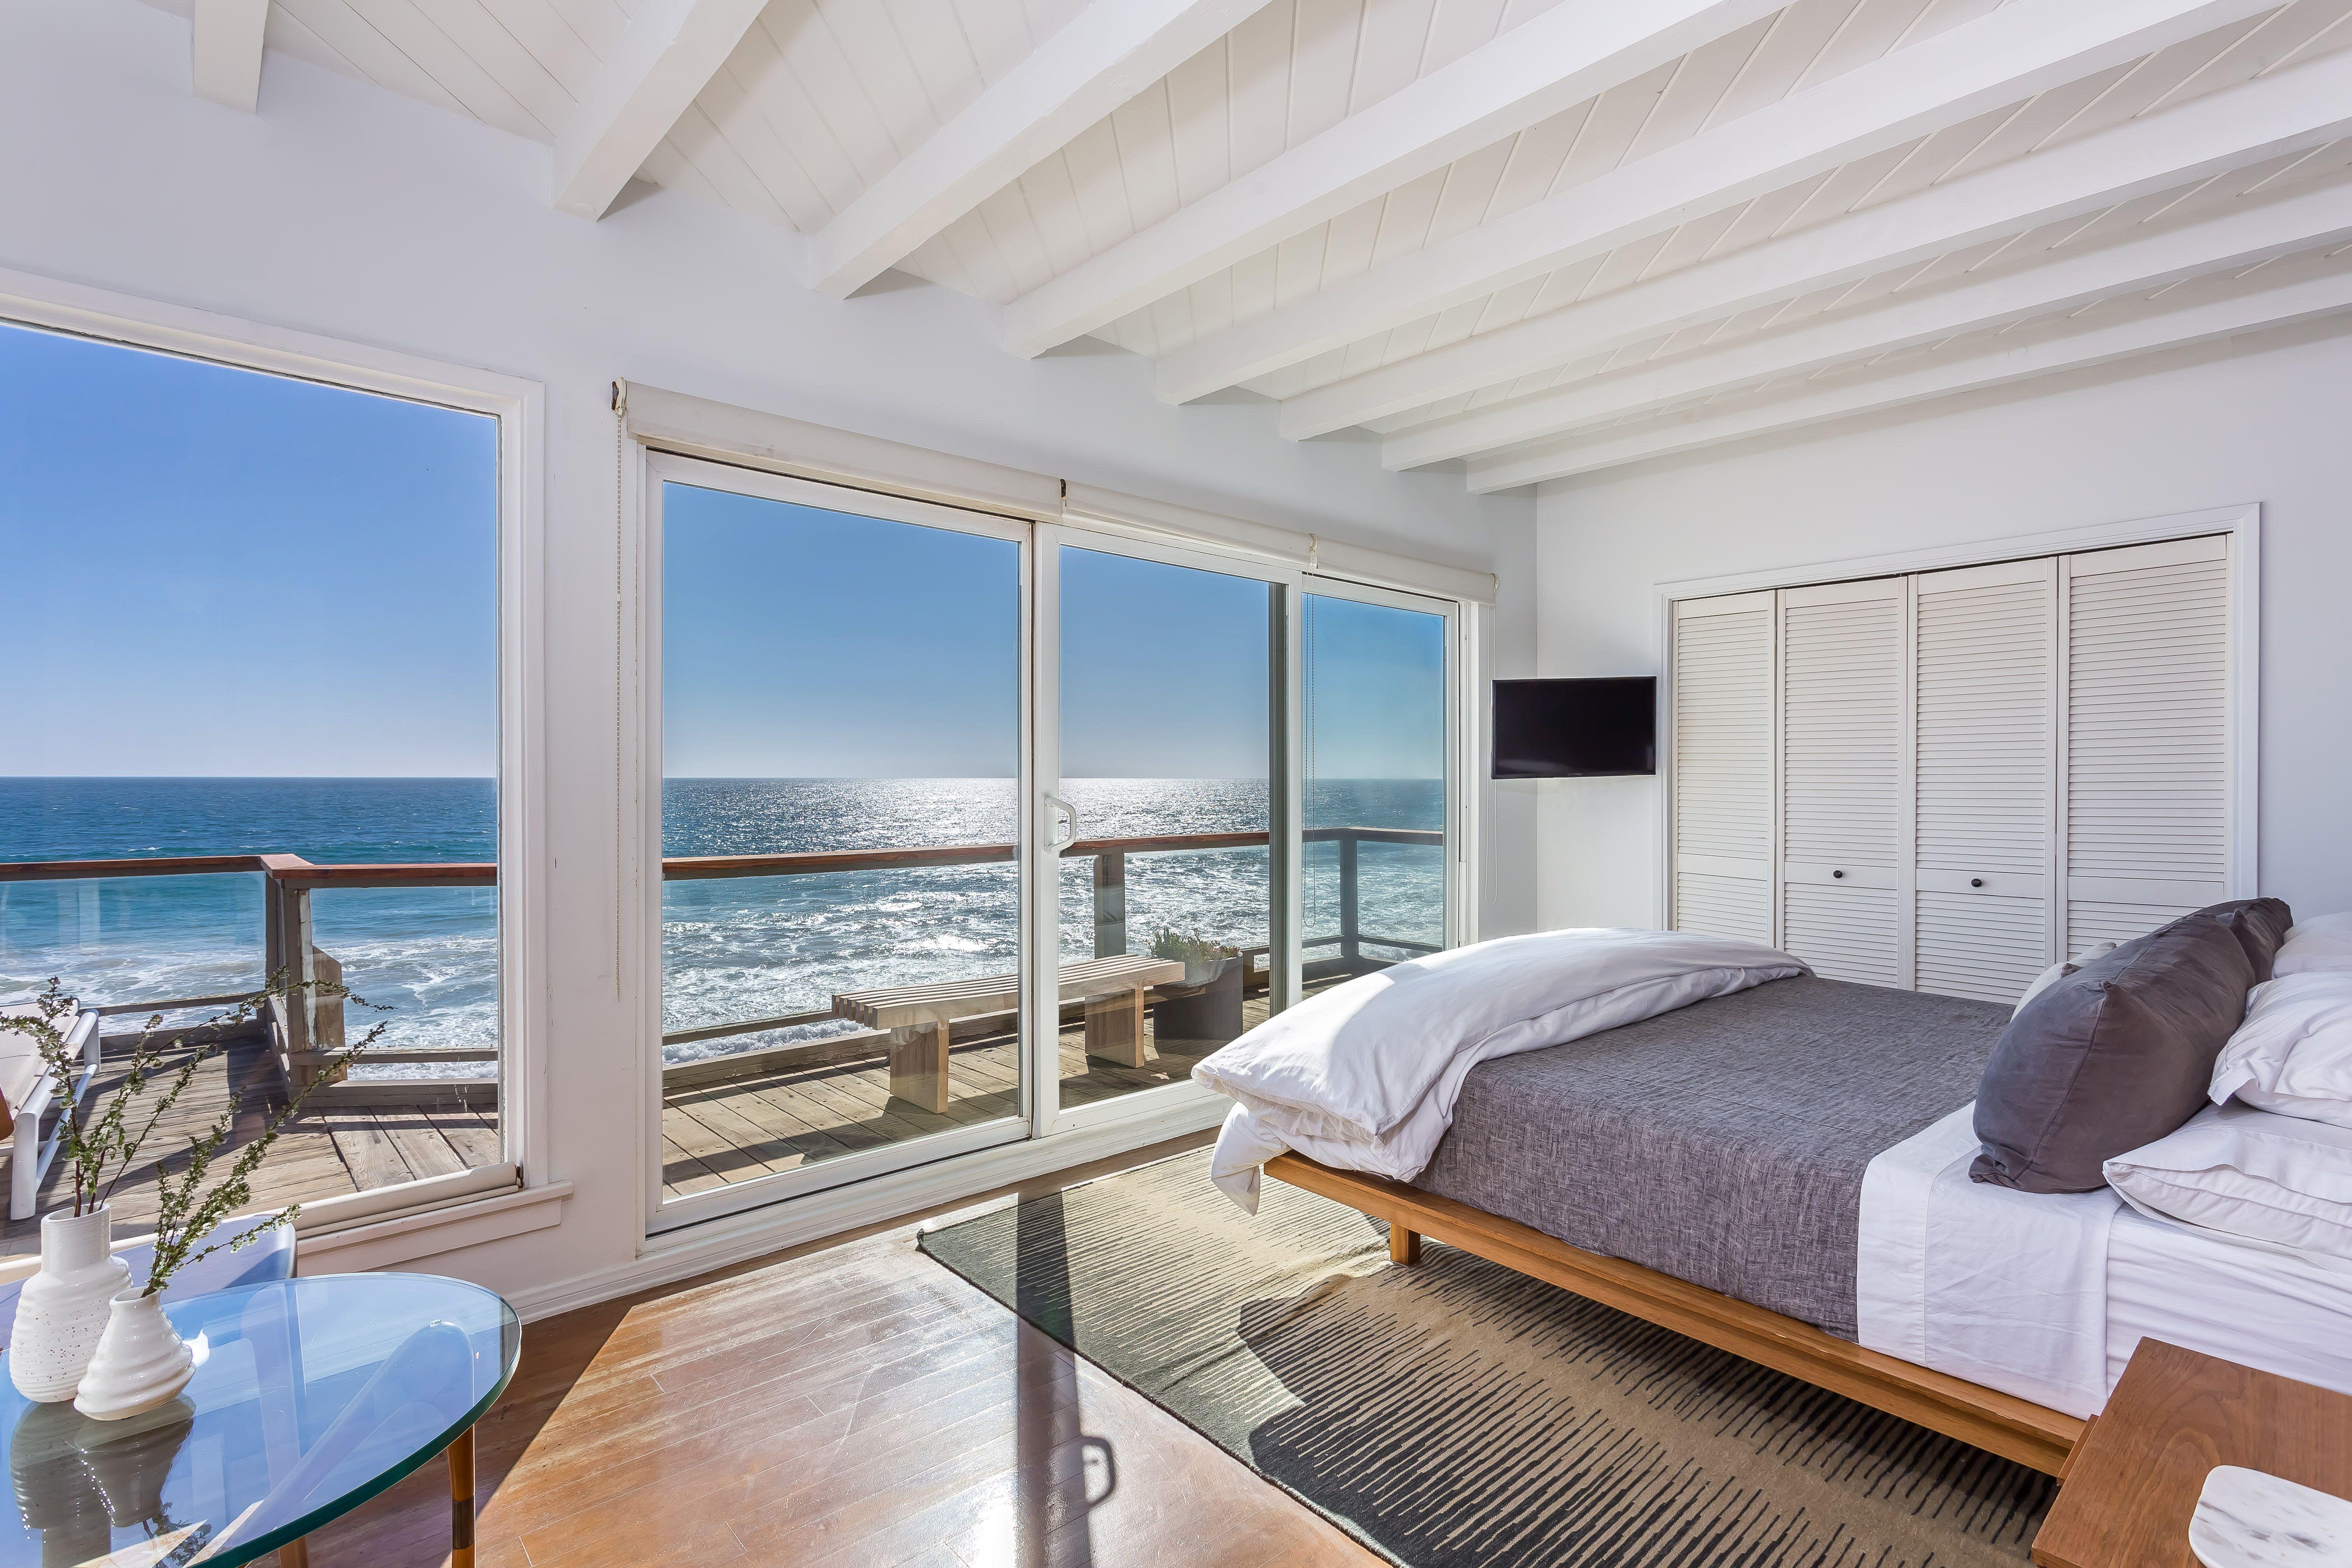 Malibu Beach Modern With Images Malibu Beach House Beach